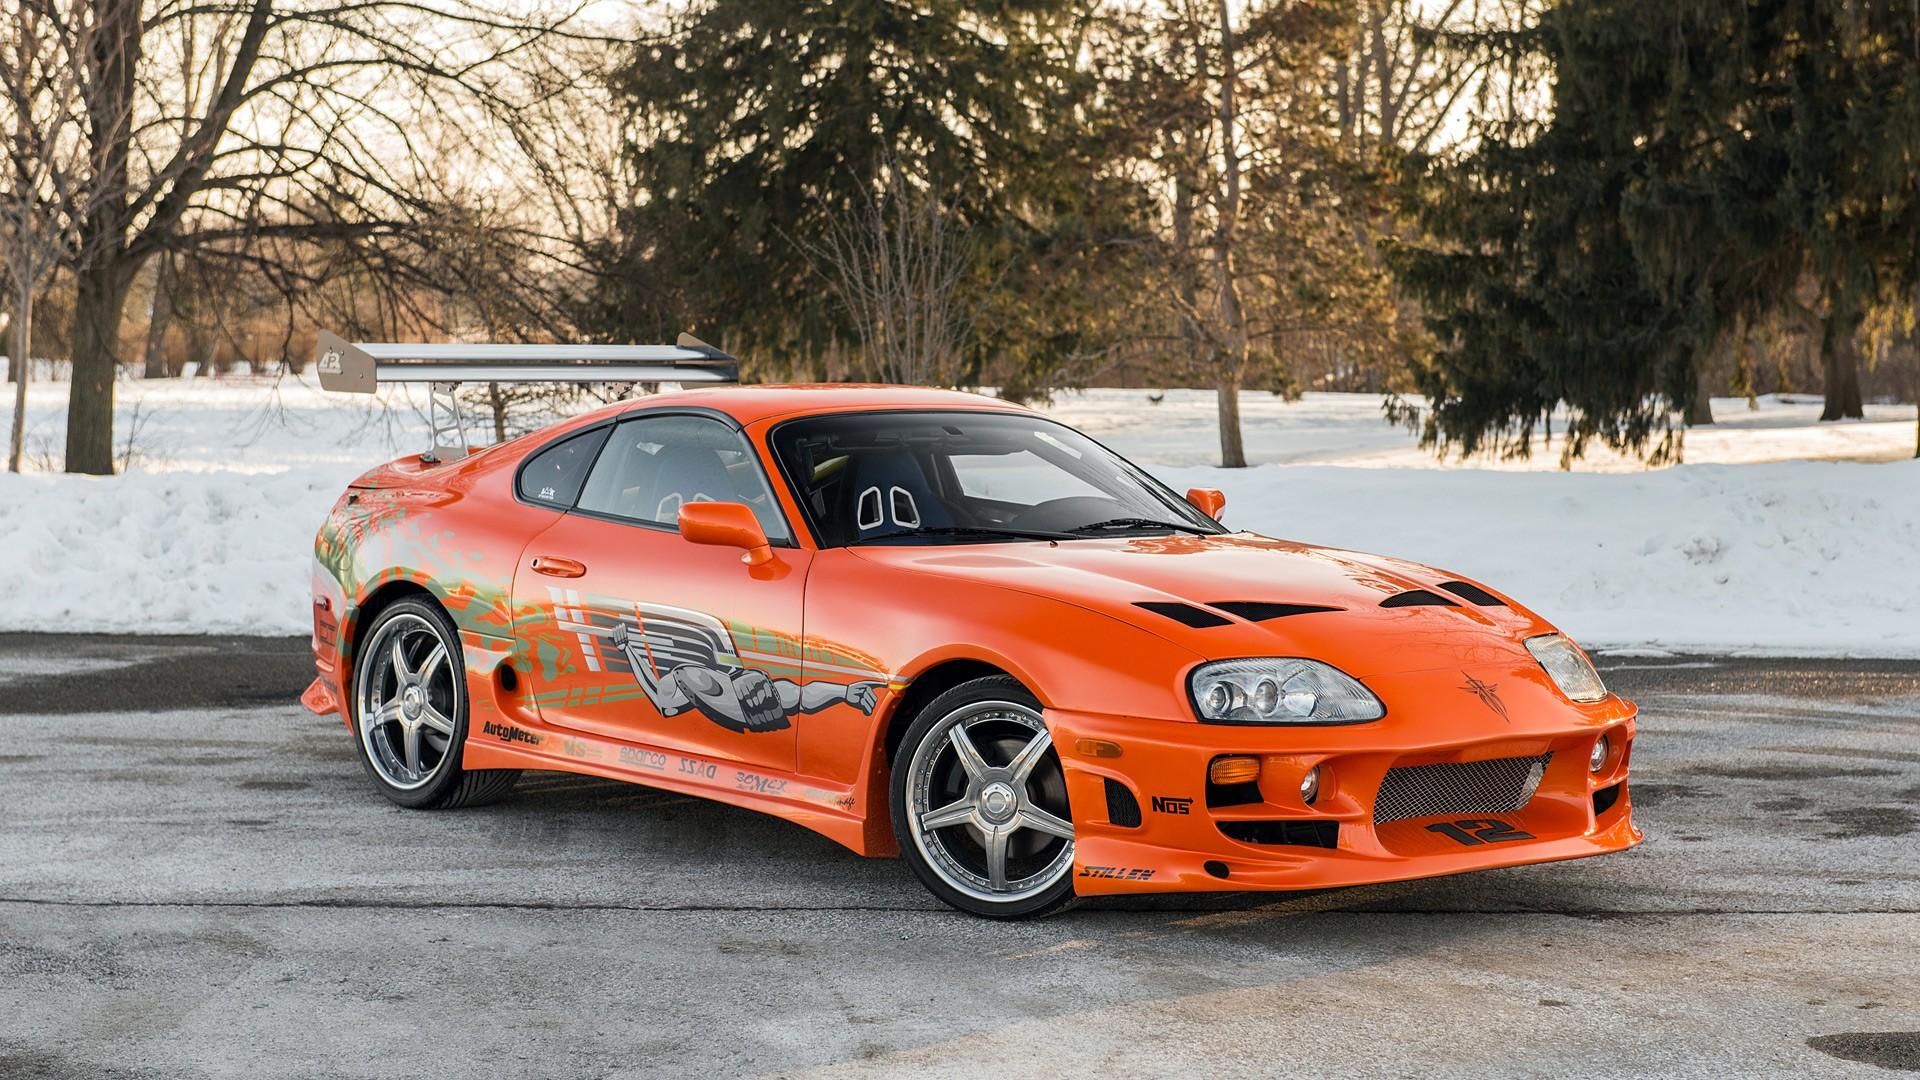 Toyota Supra Fast and Furious 2001